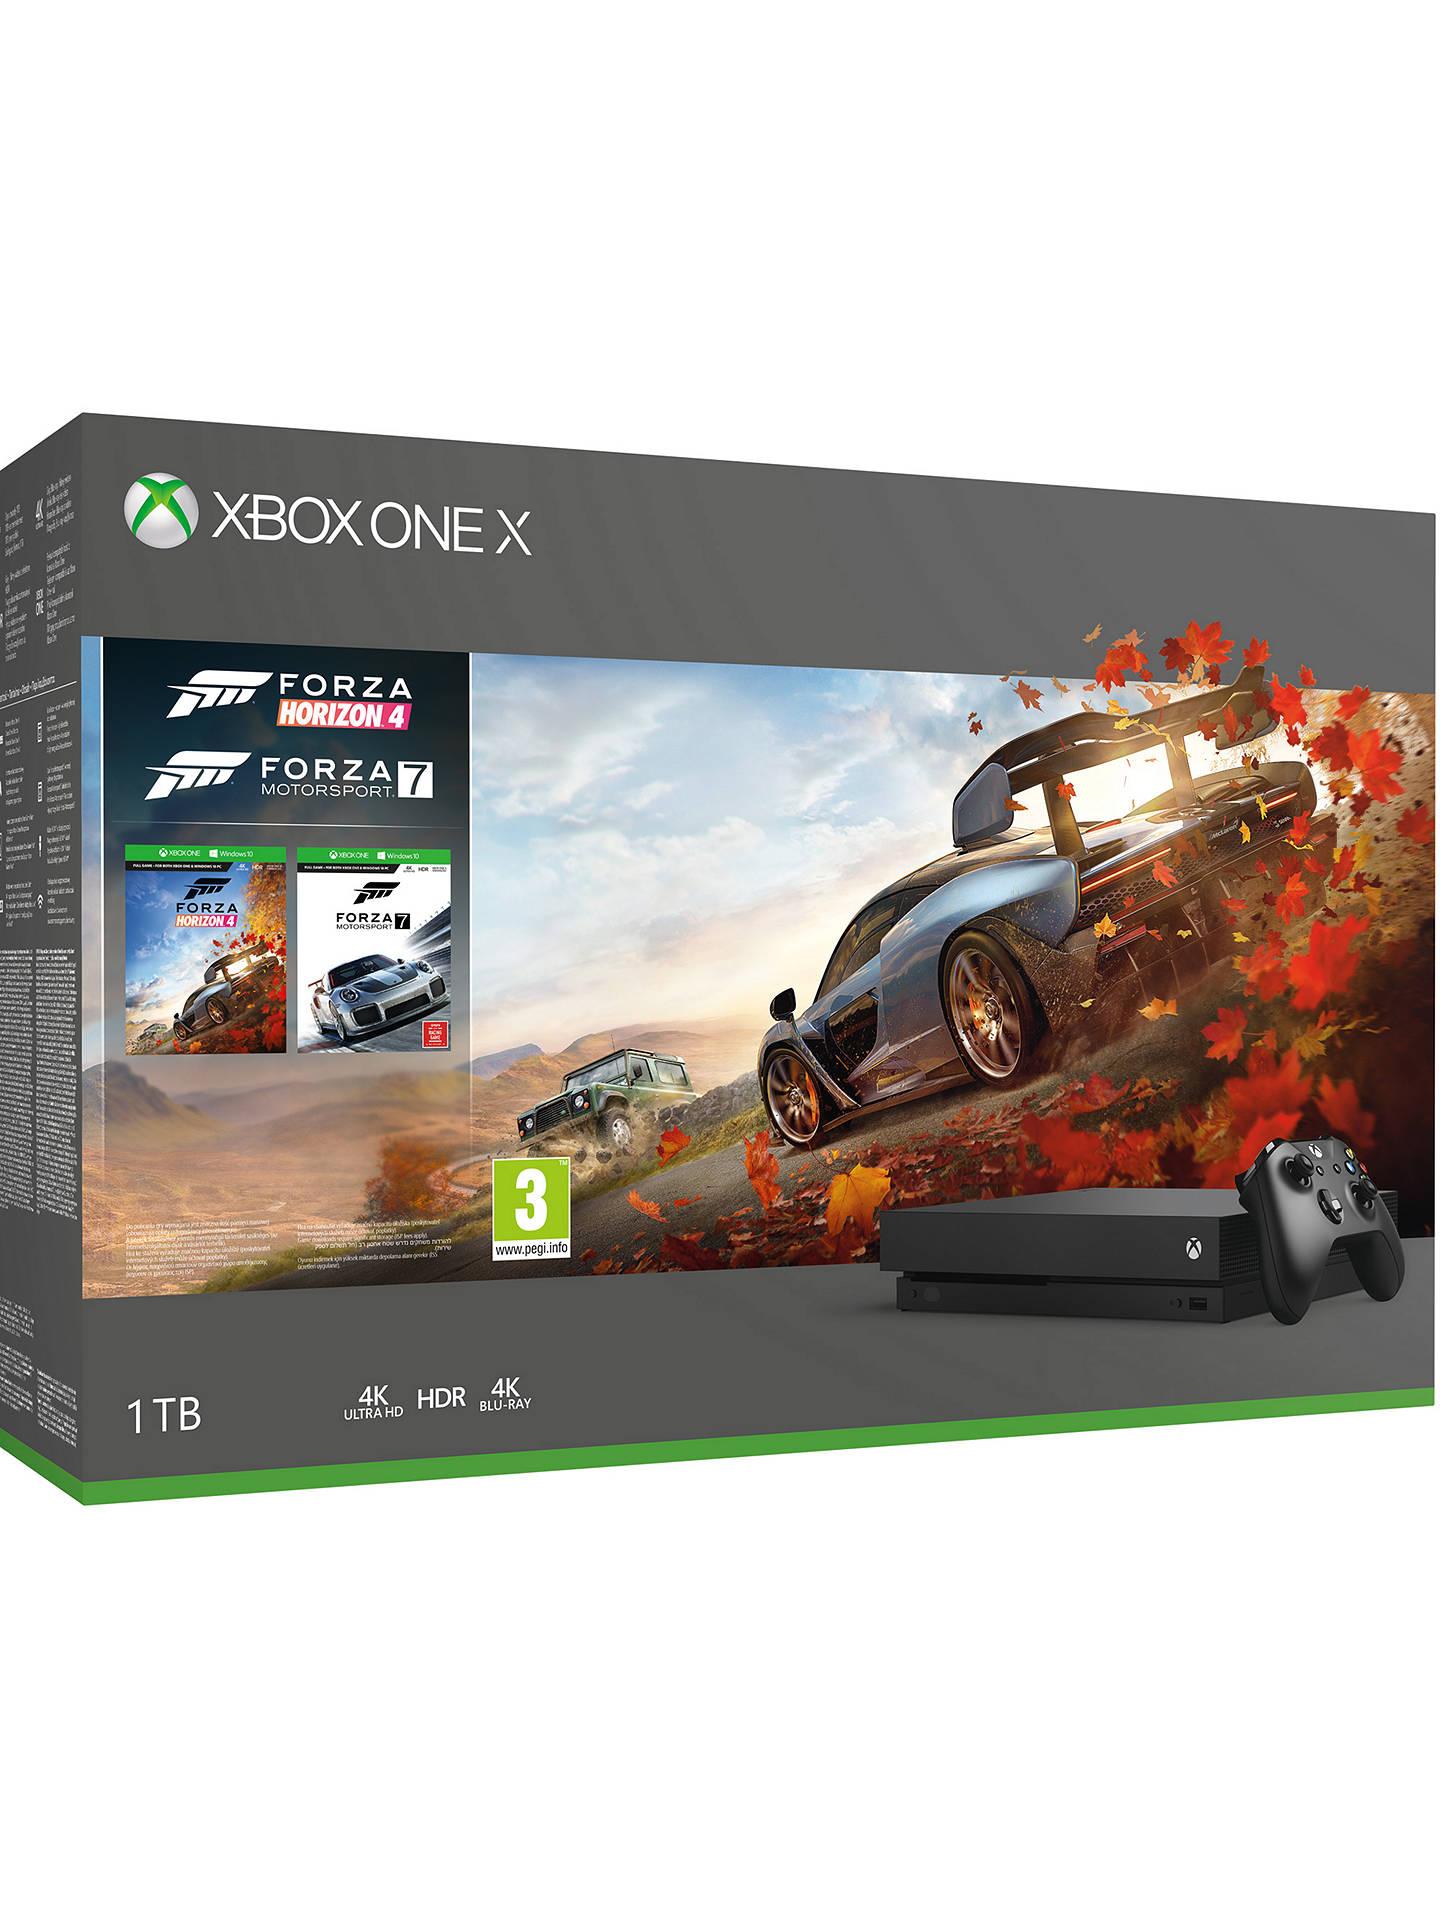 Xbox One X with Forza 7 & Horizon 4 £300 Asda Lincoln